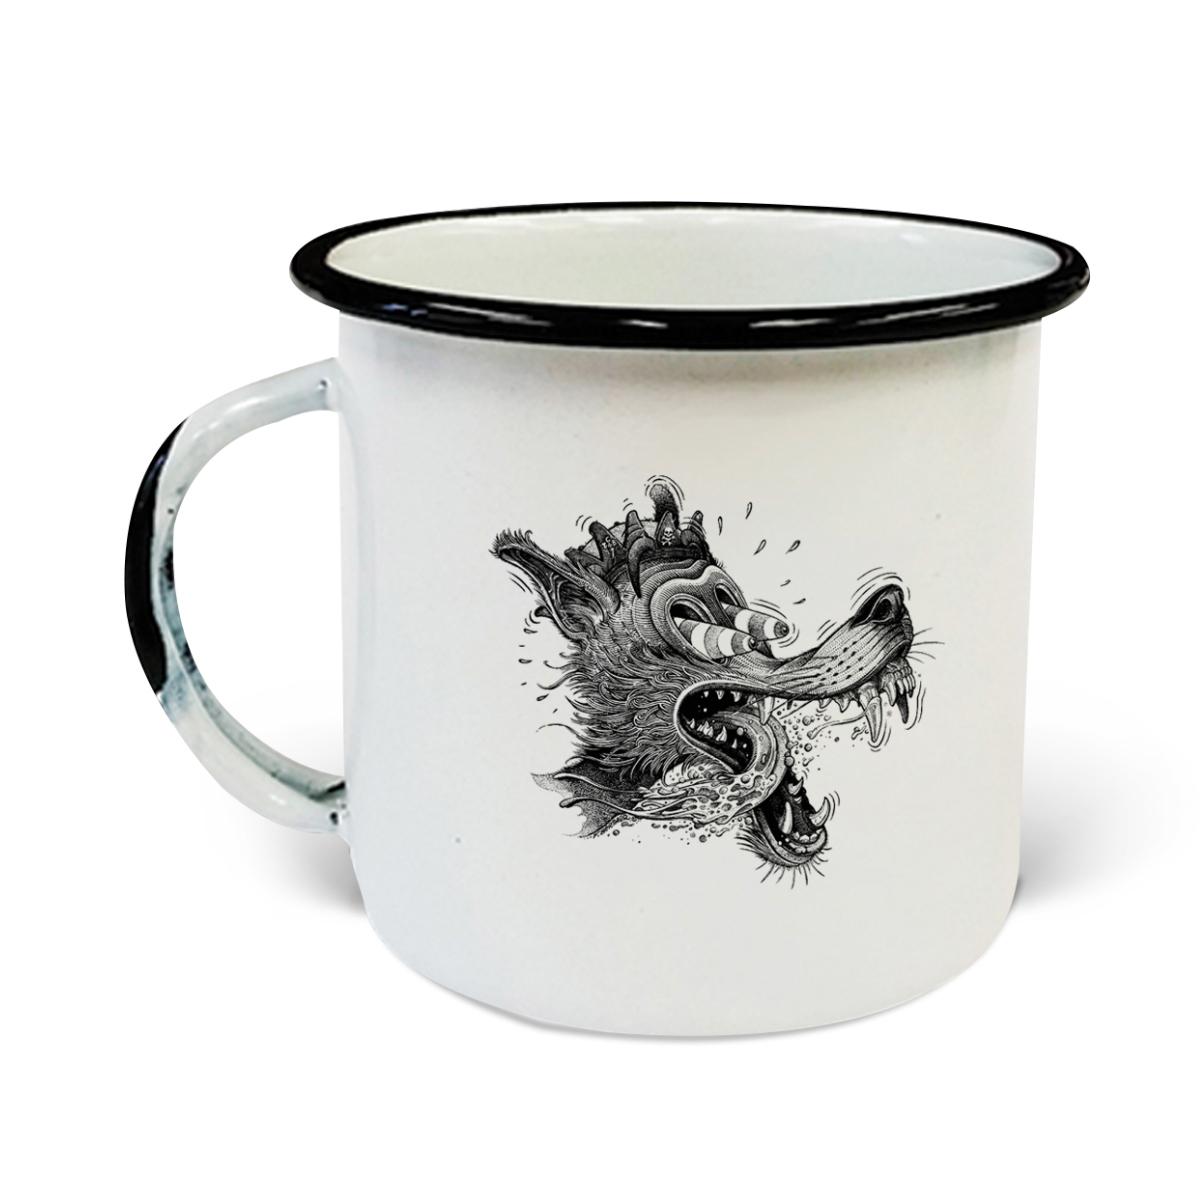 Undivided Heart & Soul Mug